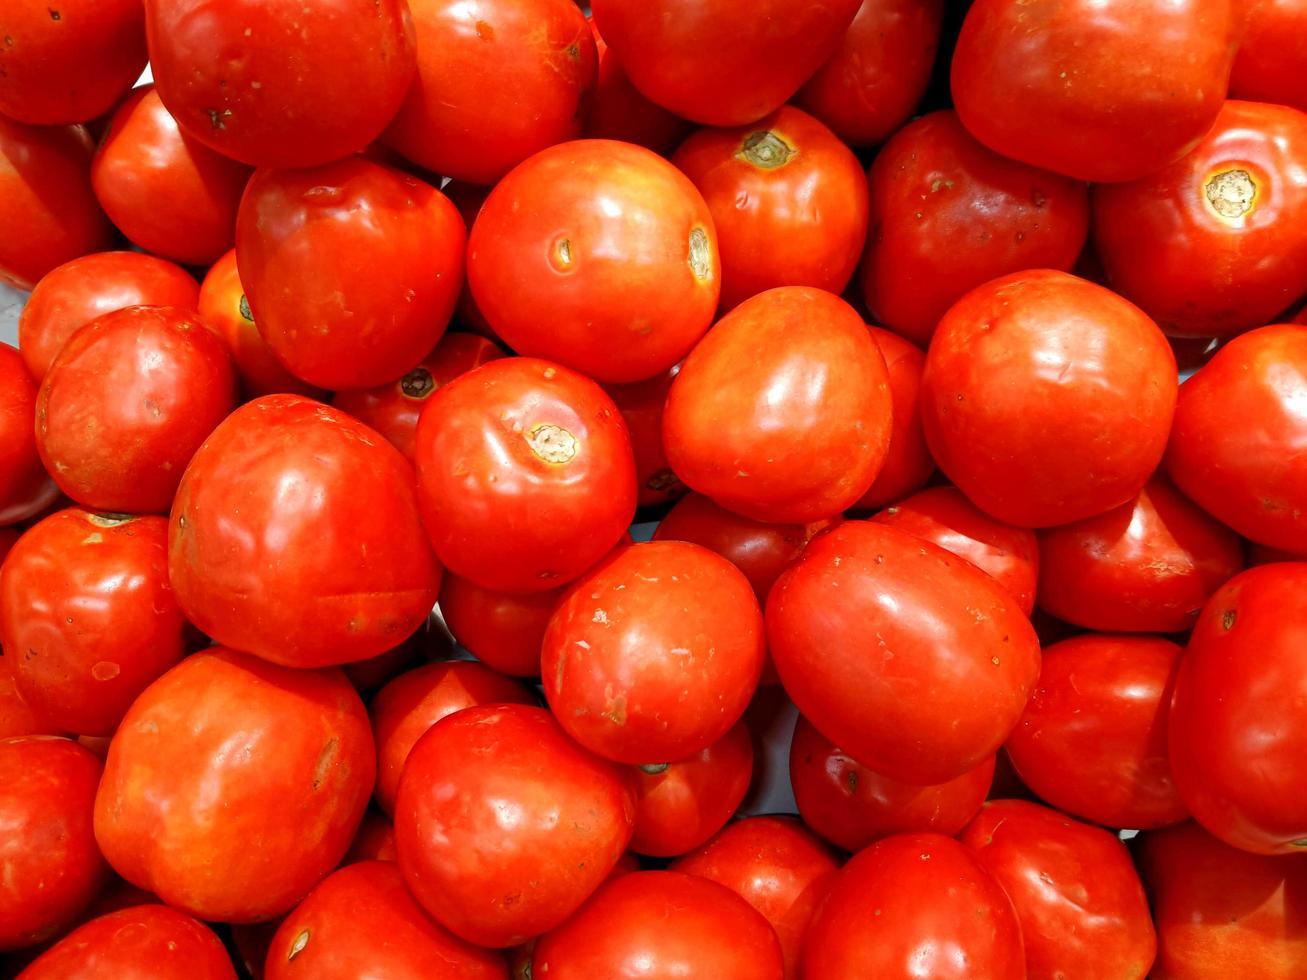 pomodori freschi cibo sano sfondo foto